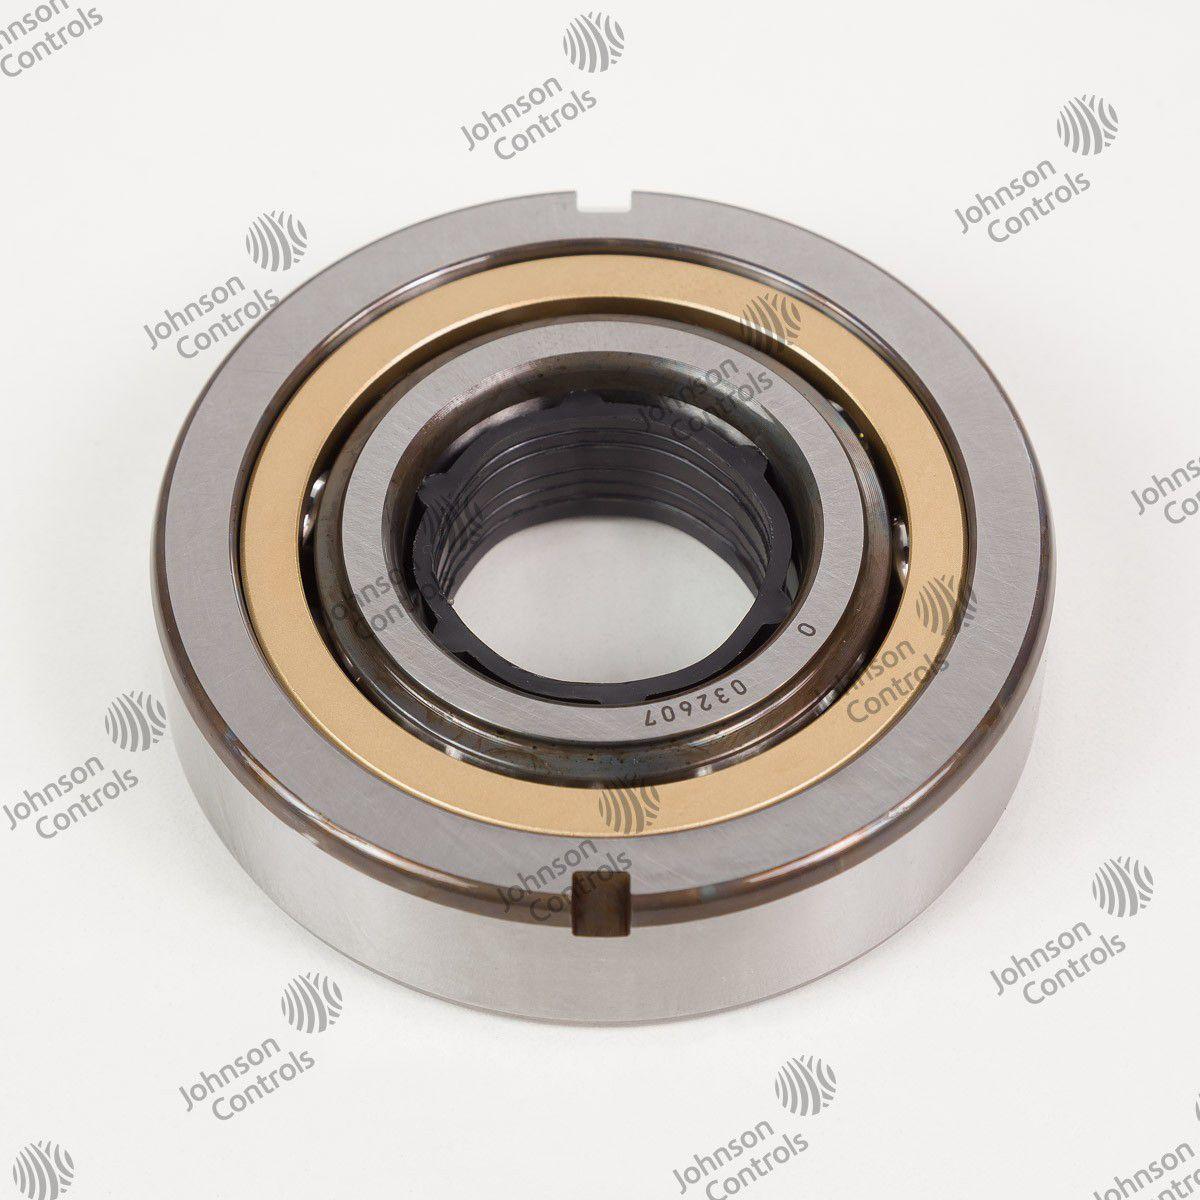 ROLAM ESF 4 PT CONT SAB128 MK2 - 1513+027